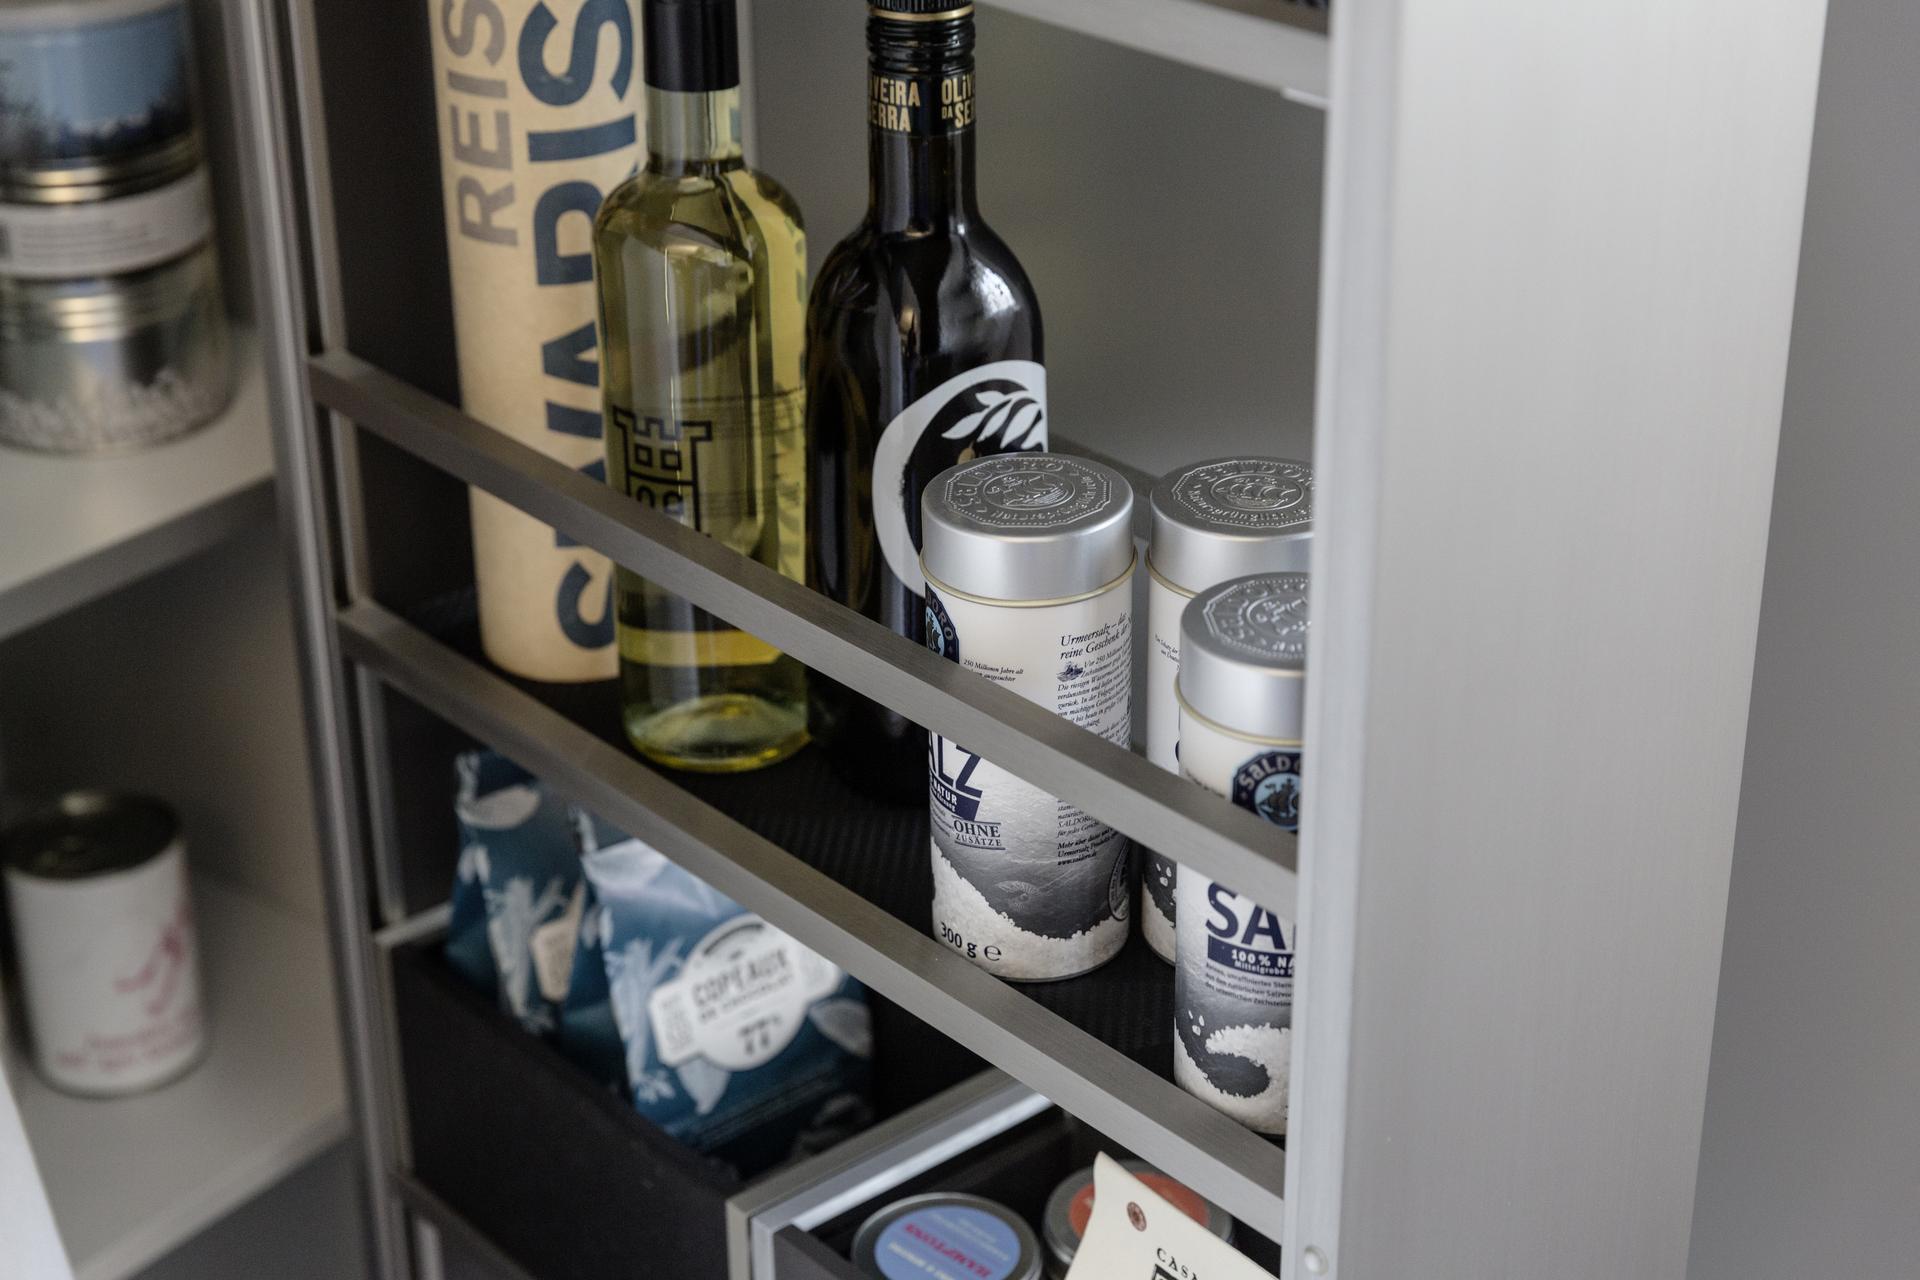 wysuwana wąska szafka w kuchni